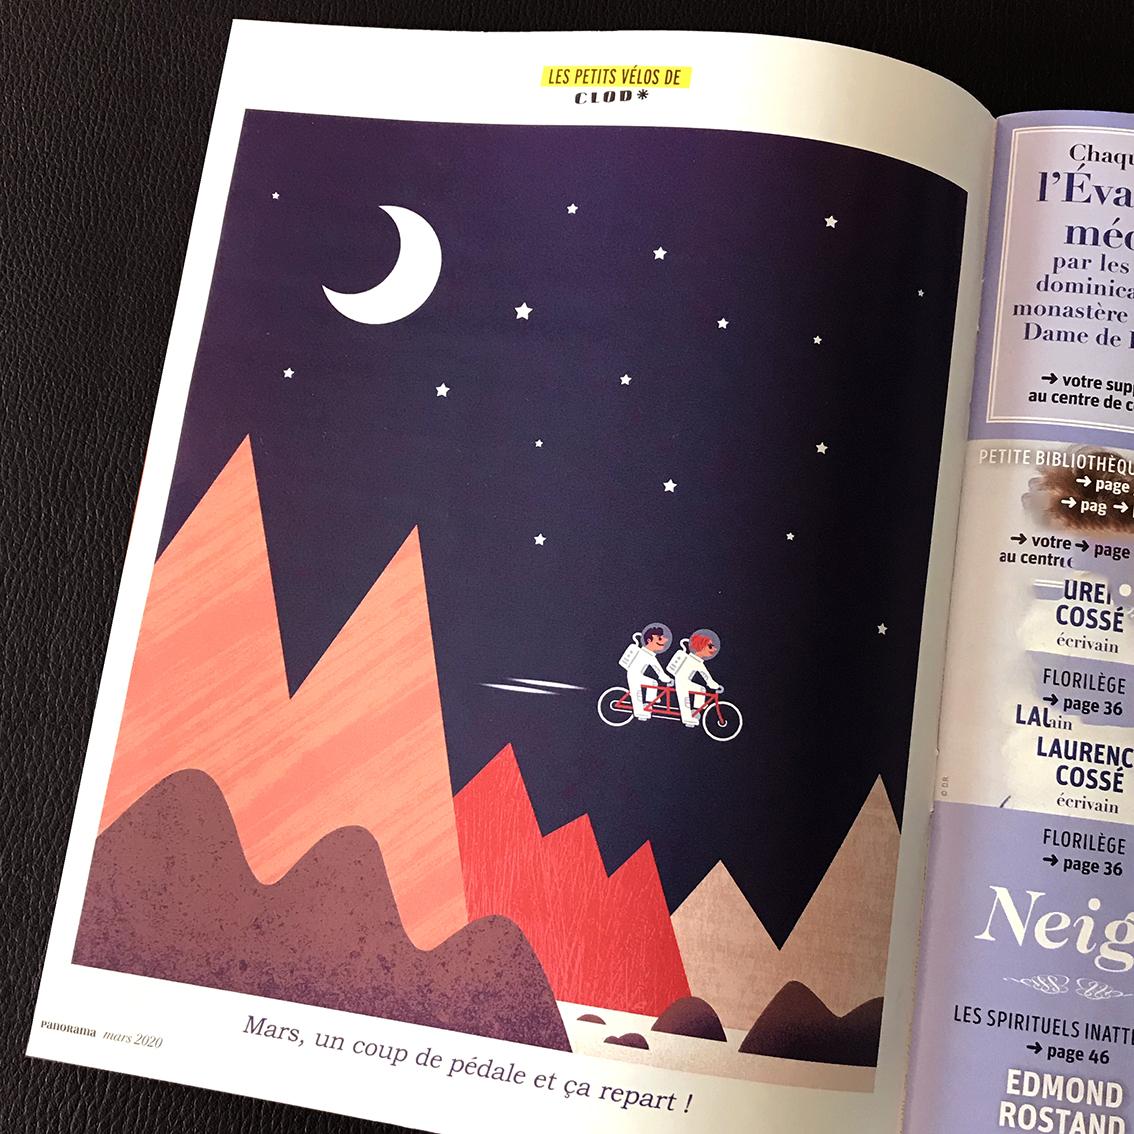 Illustration pour le magazine Panorama